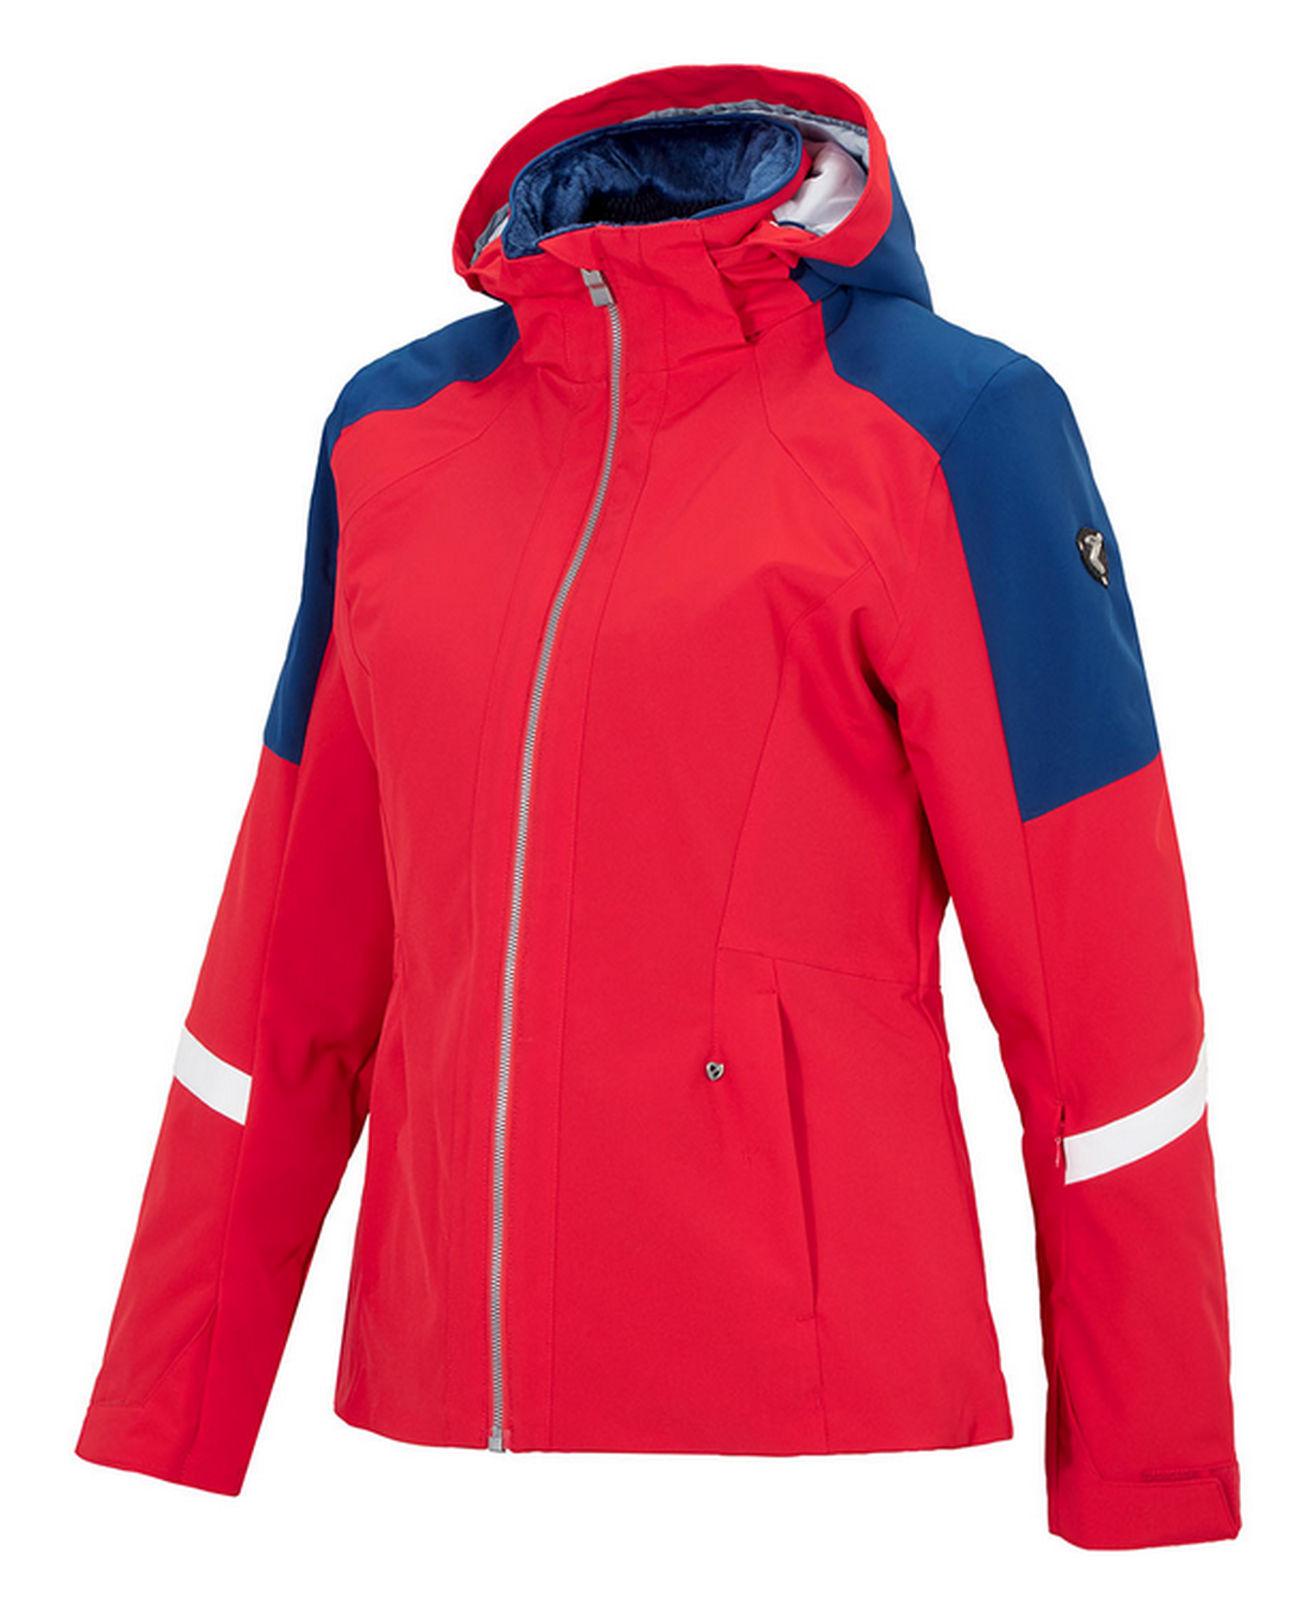 Details zu Ziener Damen Ski Jacke Winterjacke trendige Skijacke TRINE LADY rot blau